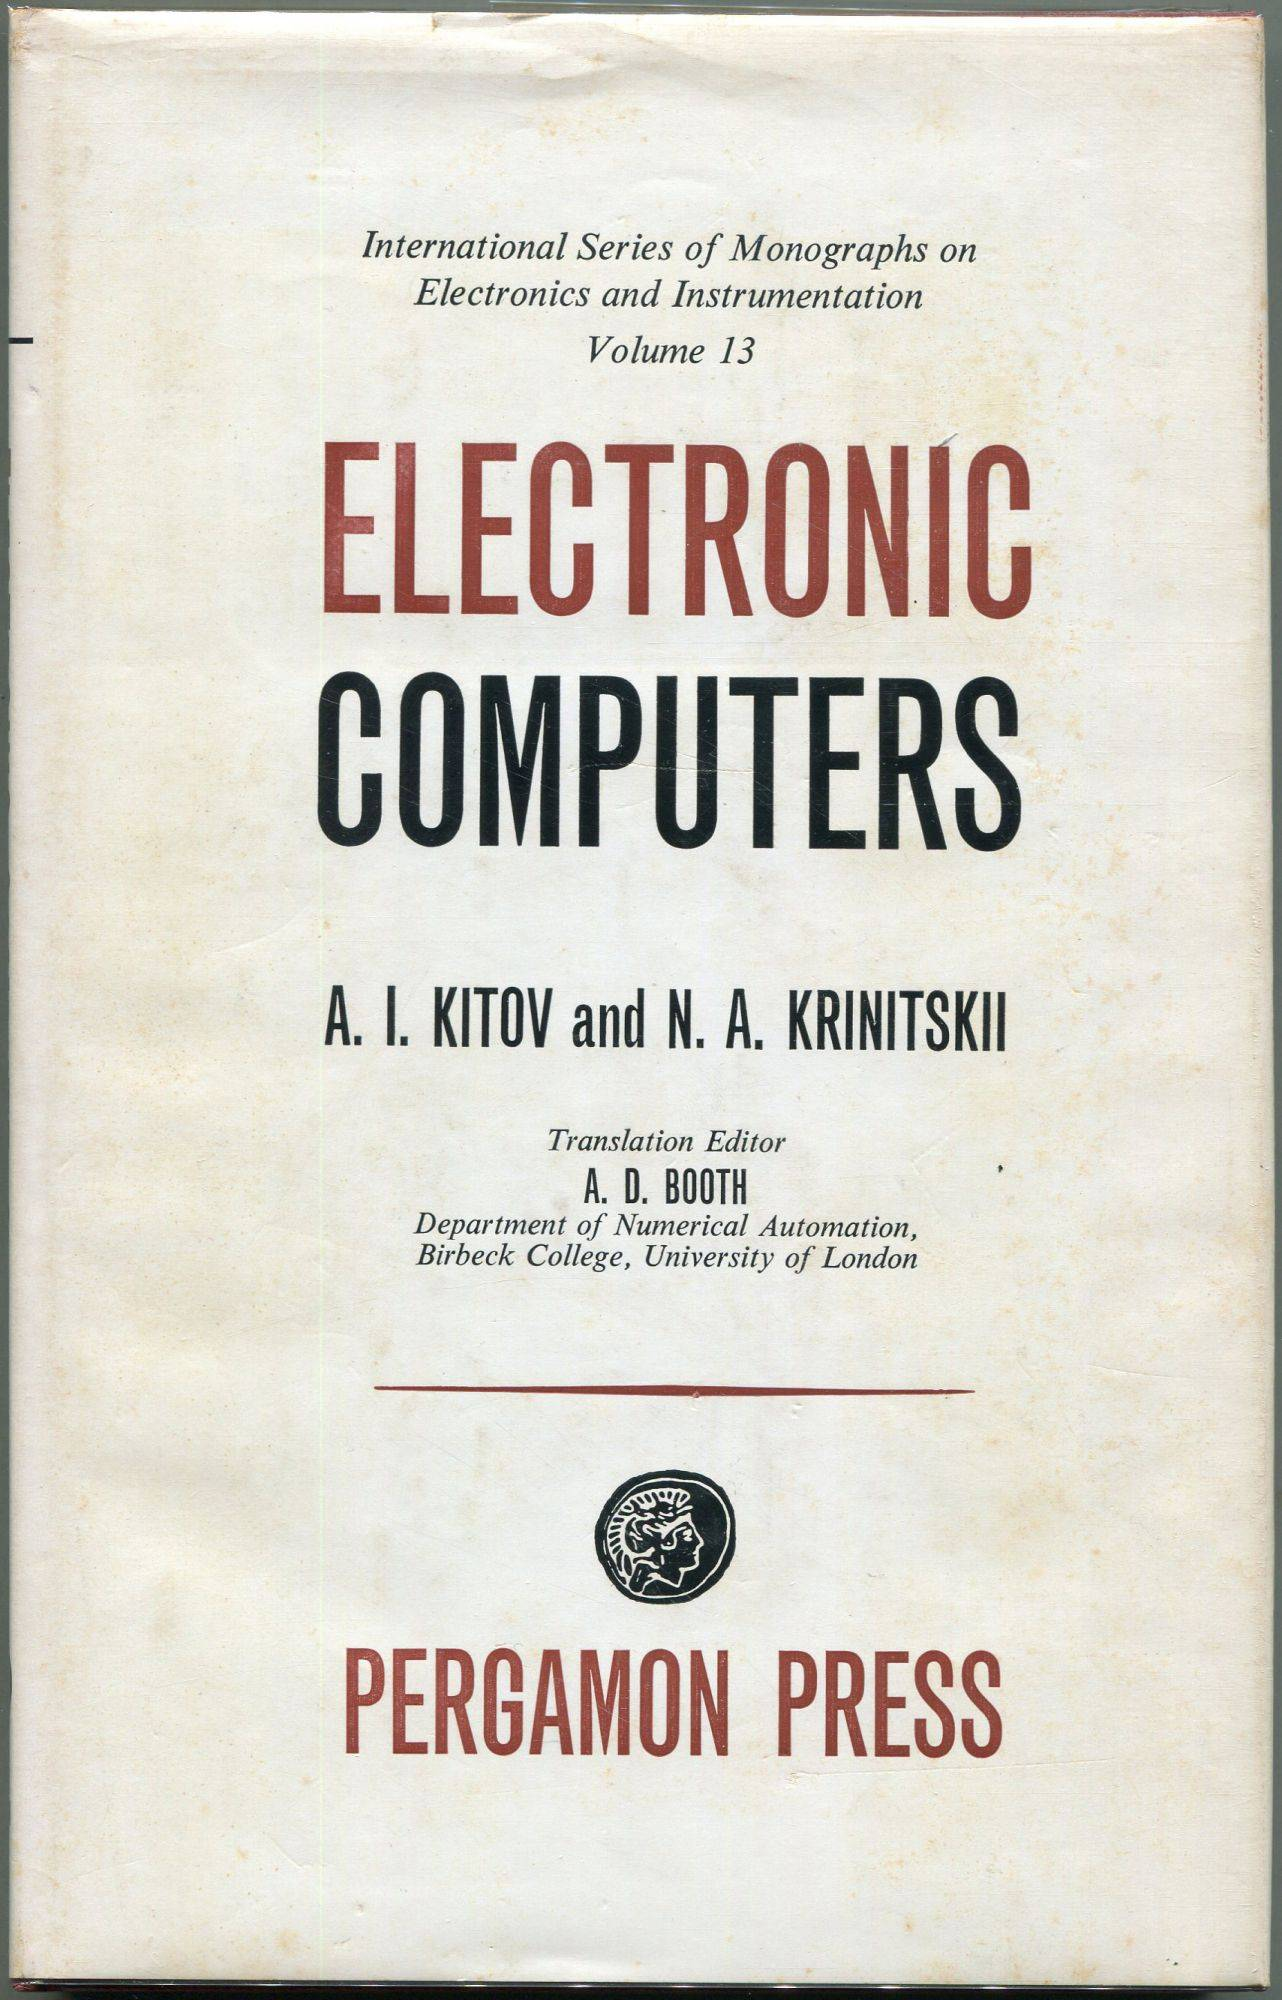 Electronic Computers Kitov, A.I.; Krinitskii, N.A. [Very Good] [Hardcover]